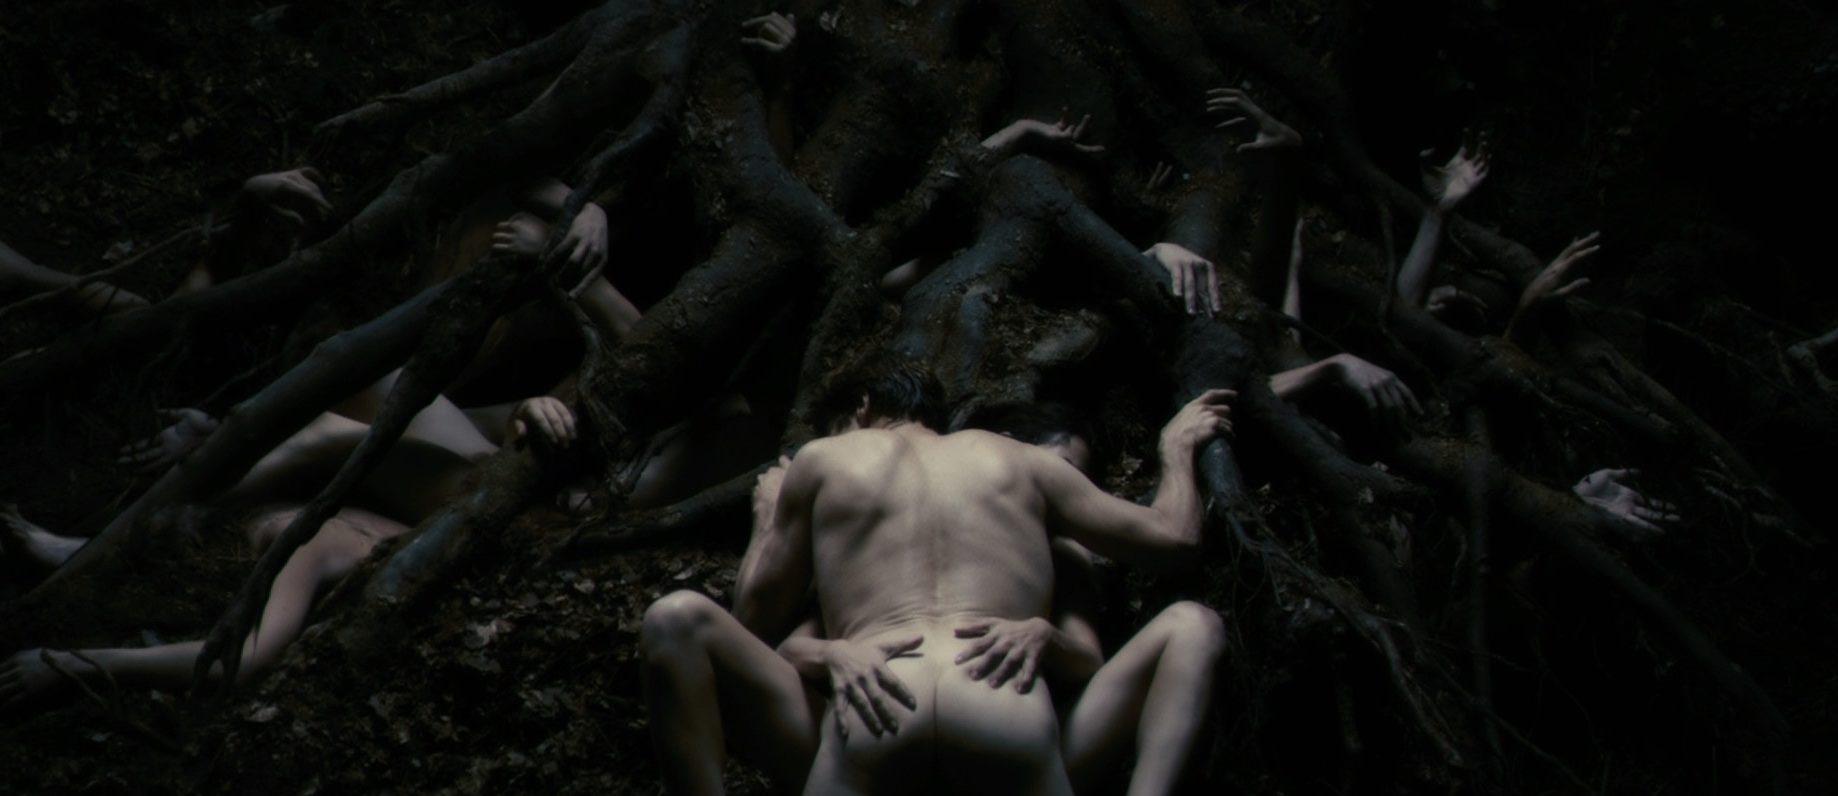 antichrist-sex